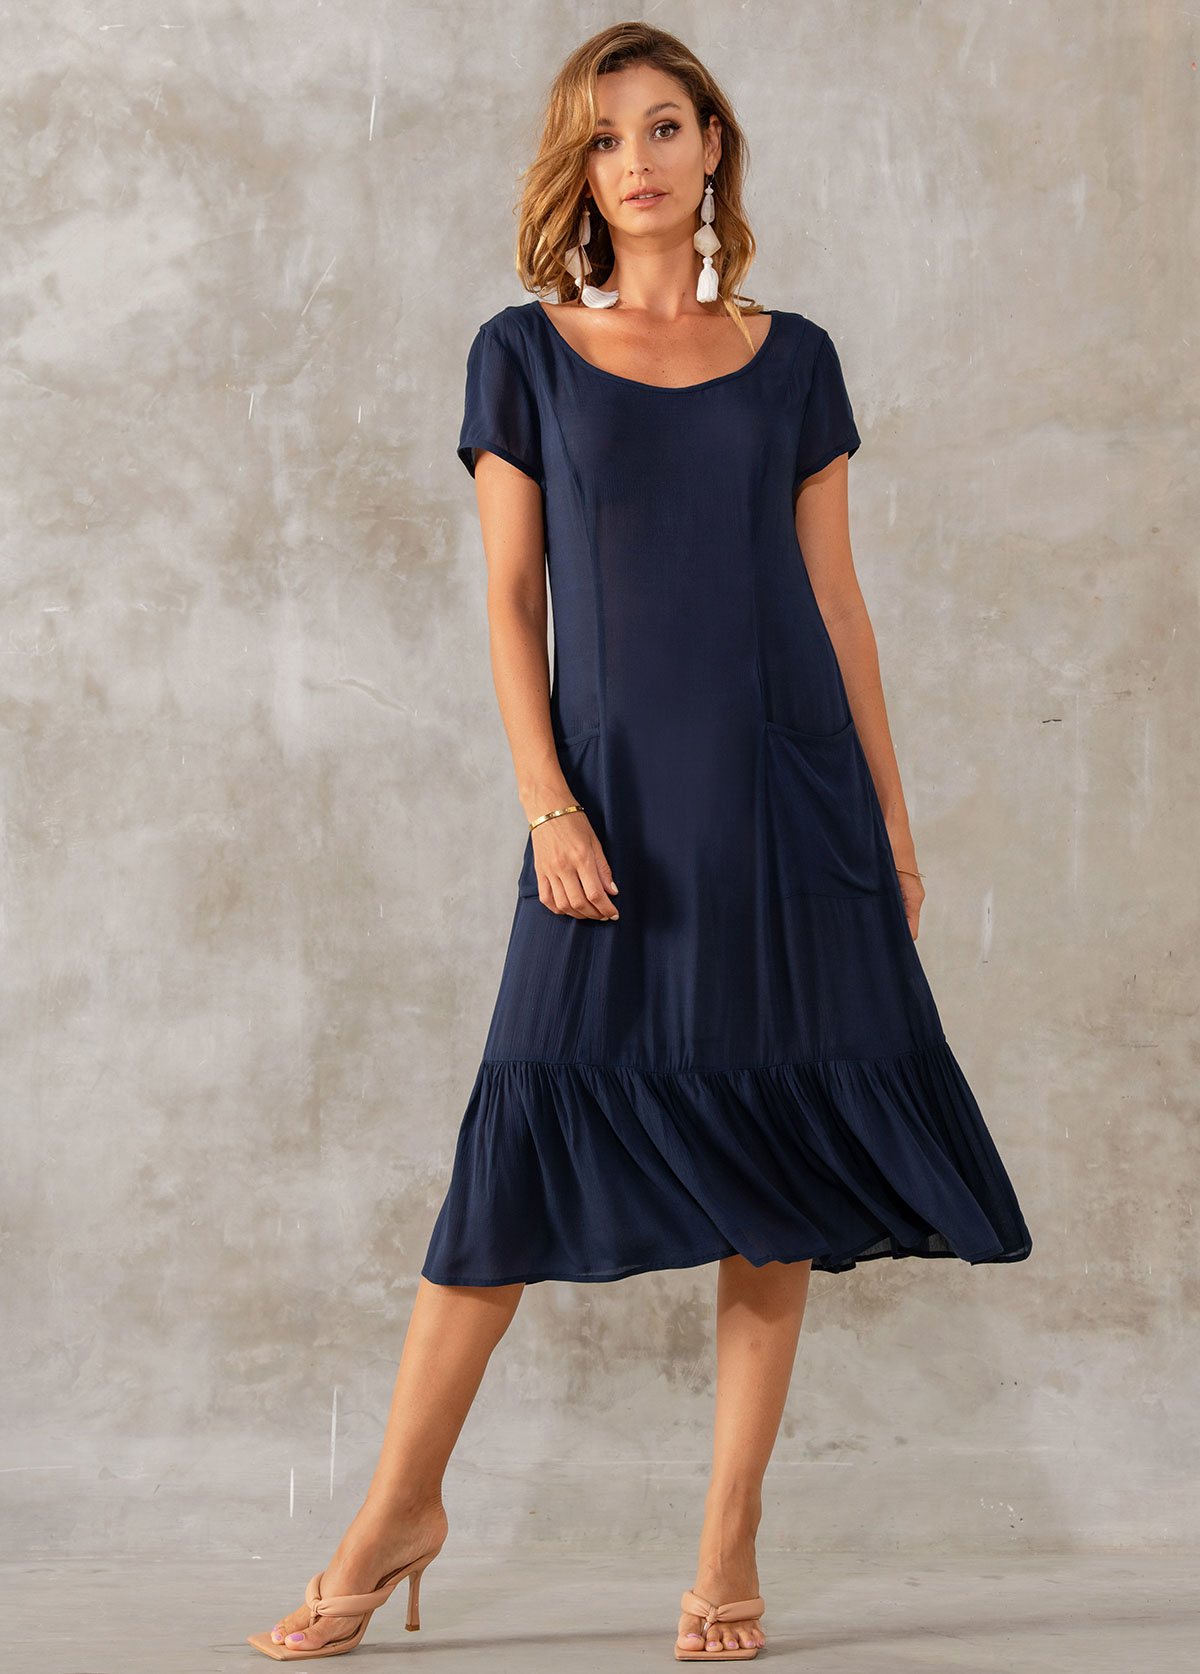 ROTITA Pocket Detail Round Neck Short Sleeve Dress